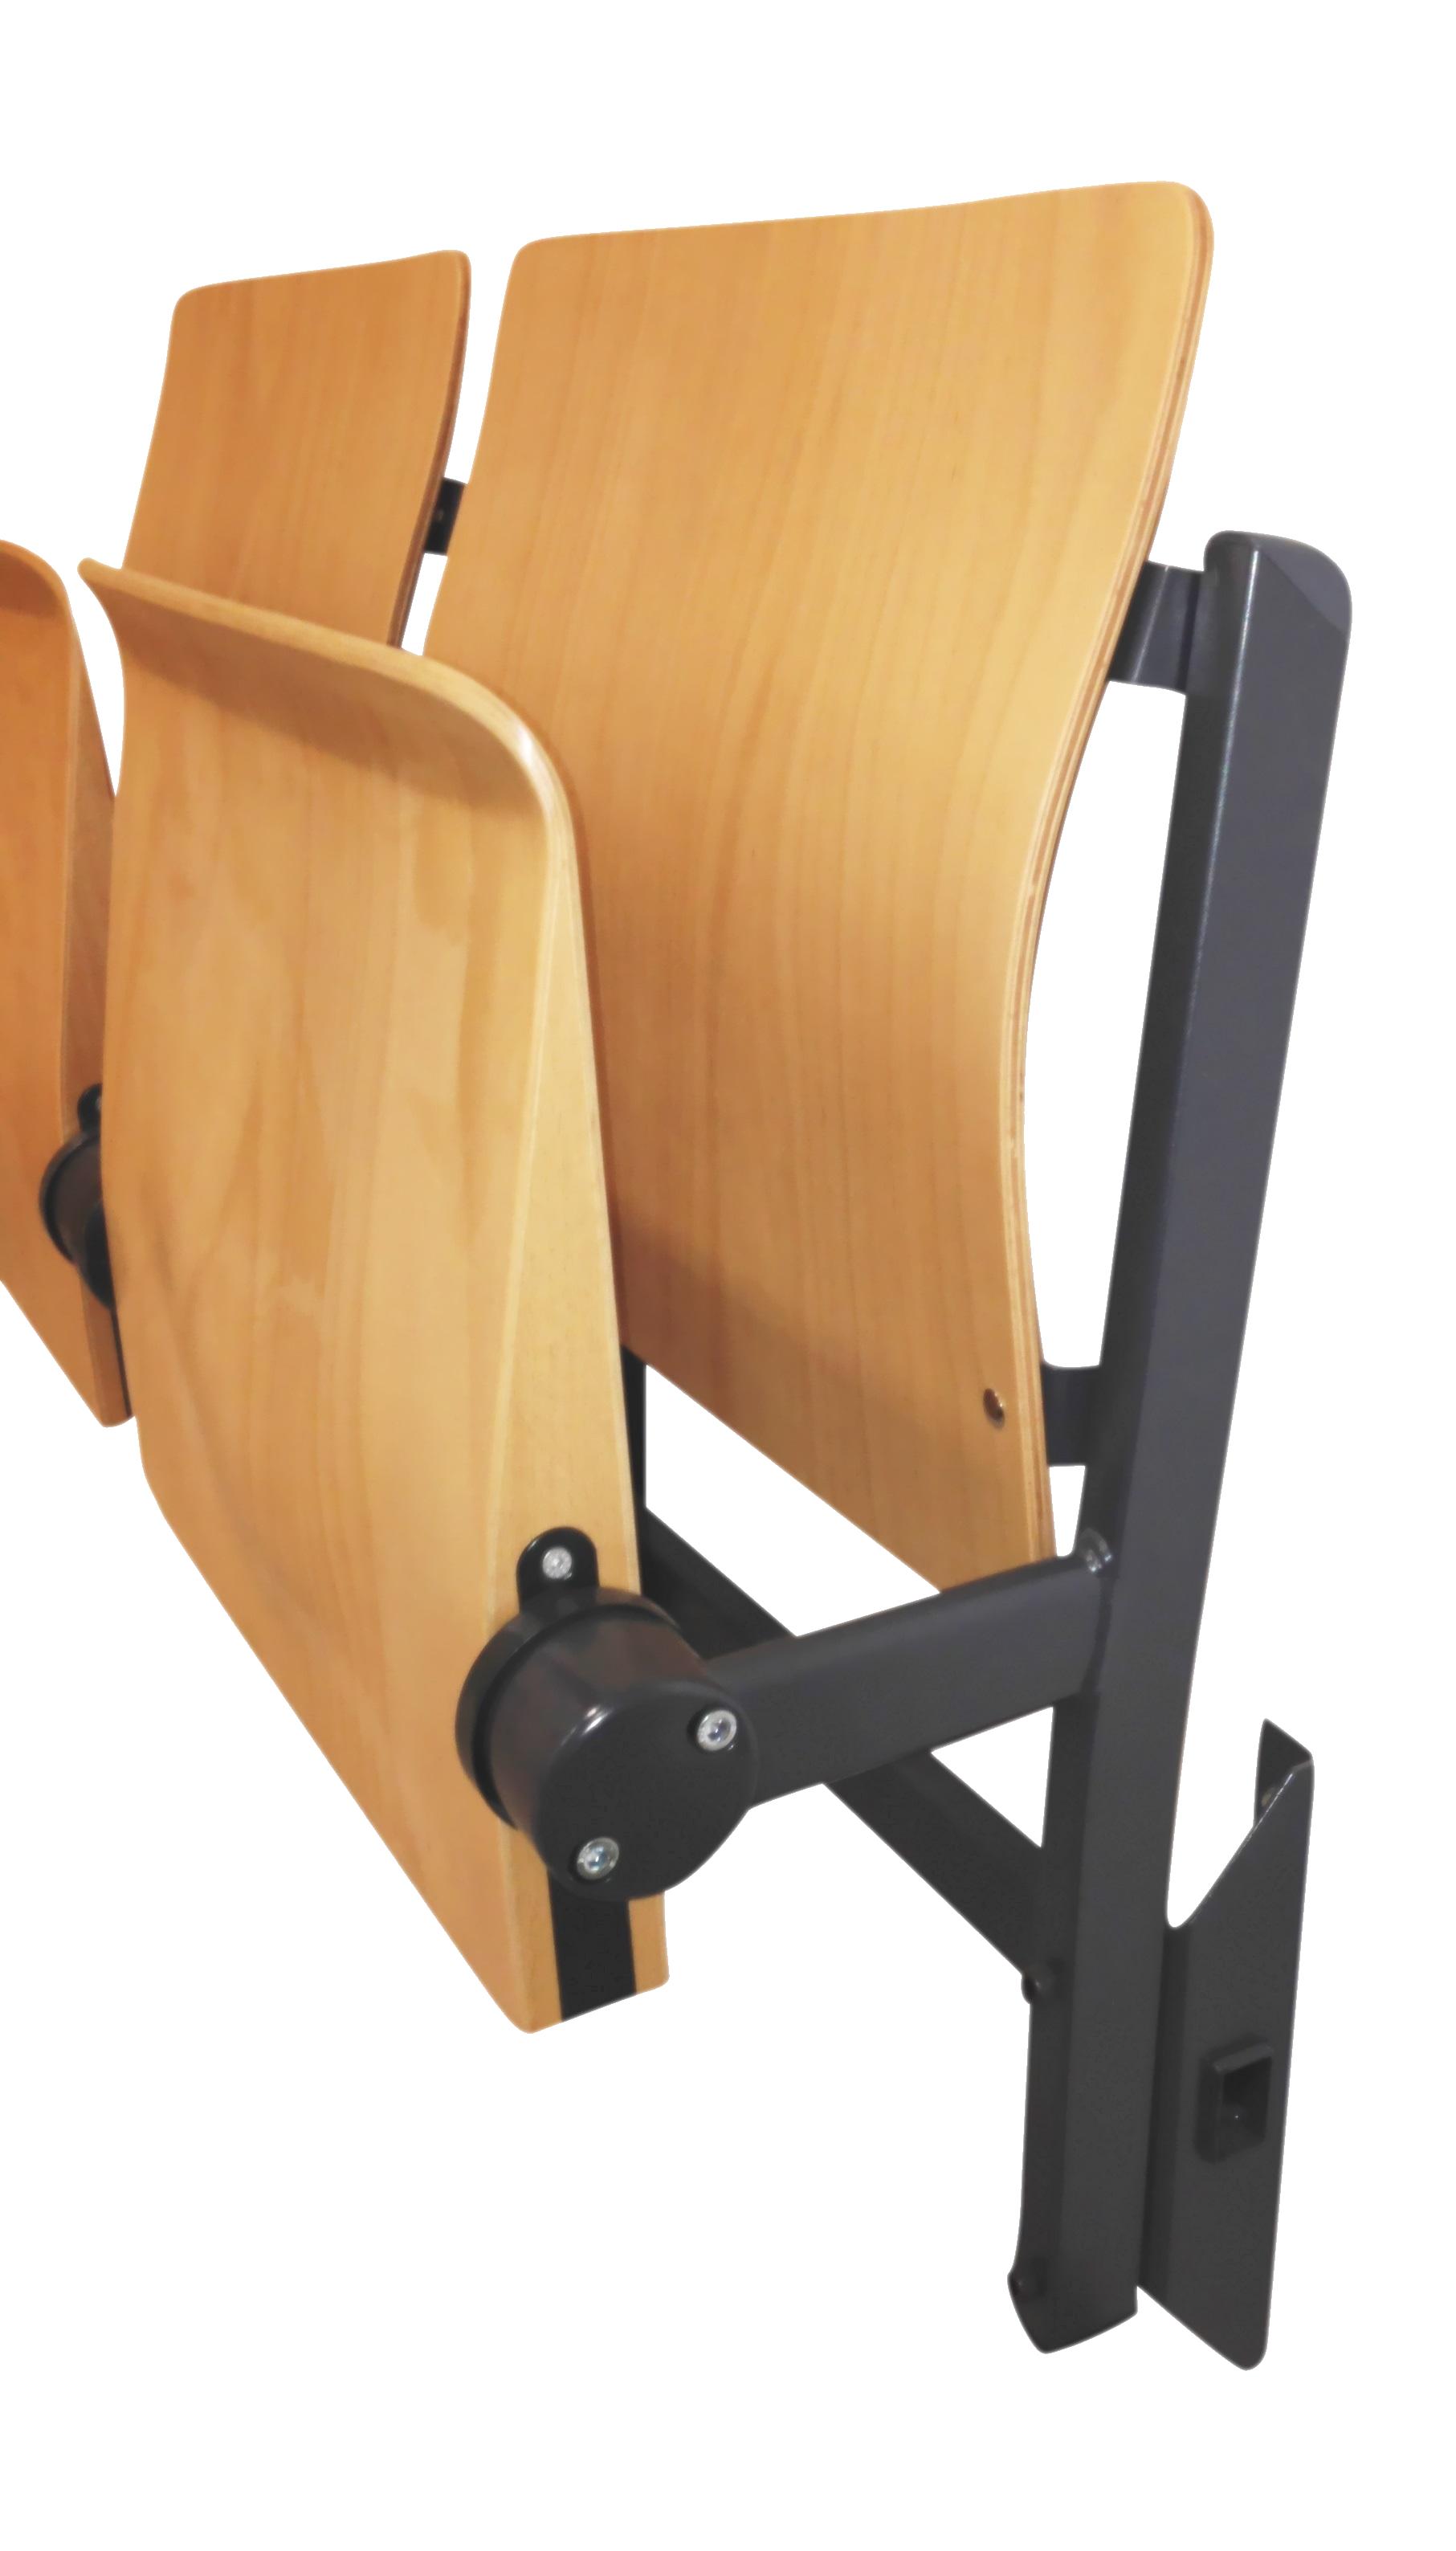 Wandklstuhl Klstuhl FÜr Wandmontage Hörsaalbestuhlung Hörsaalgestühl Wandklsitz